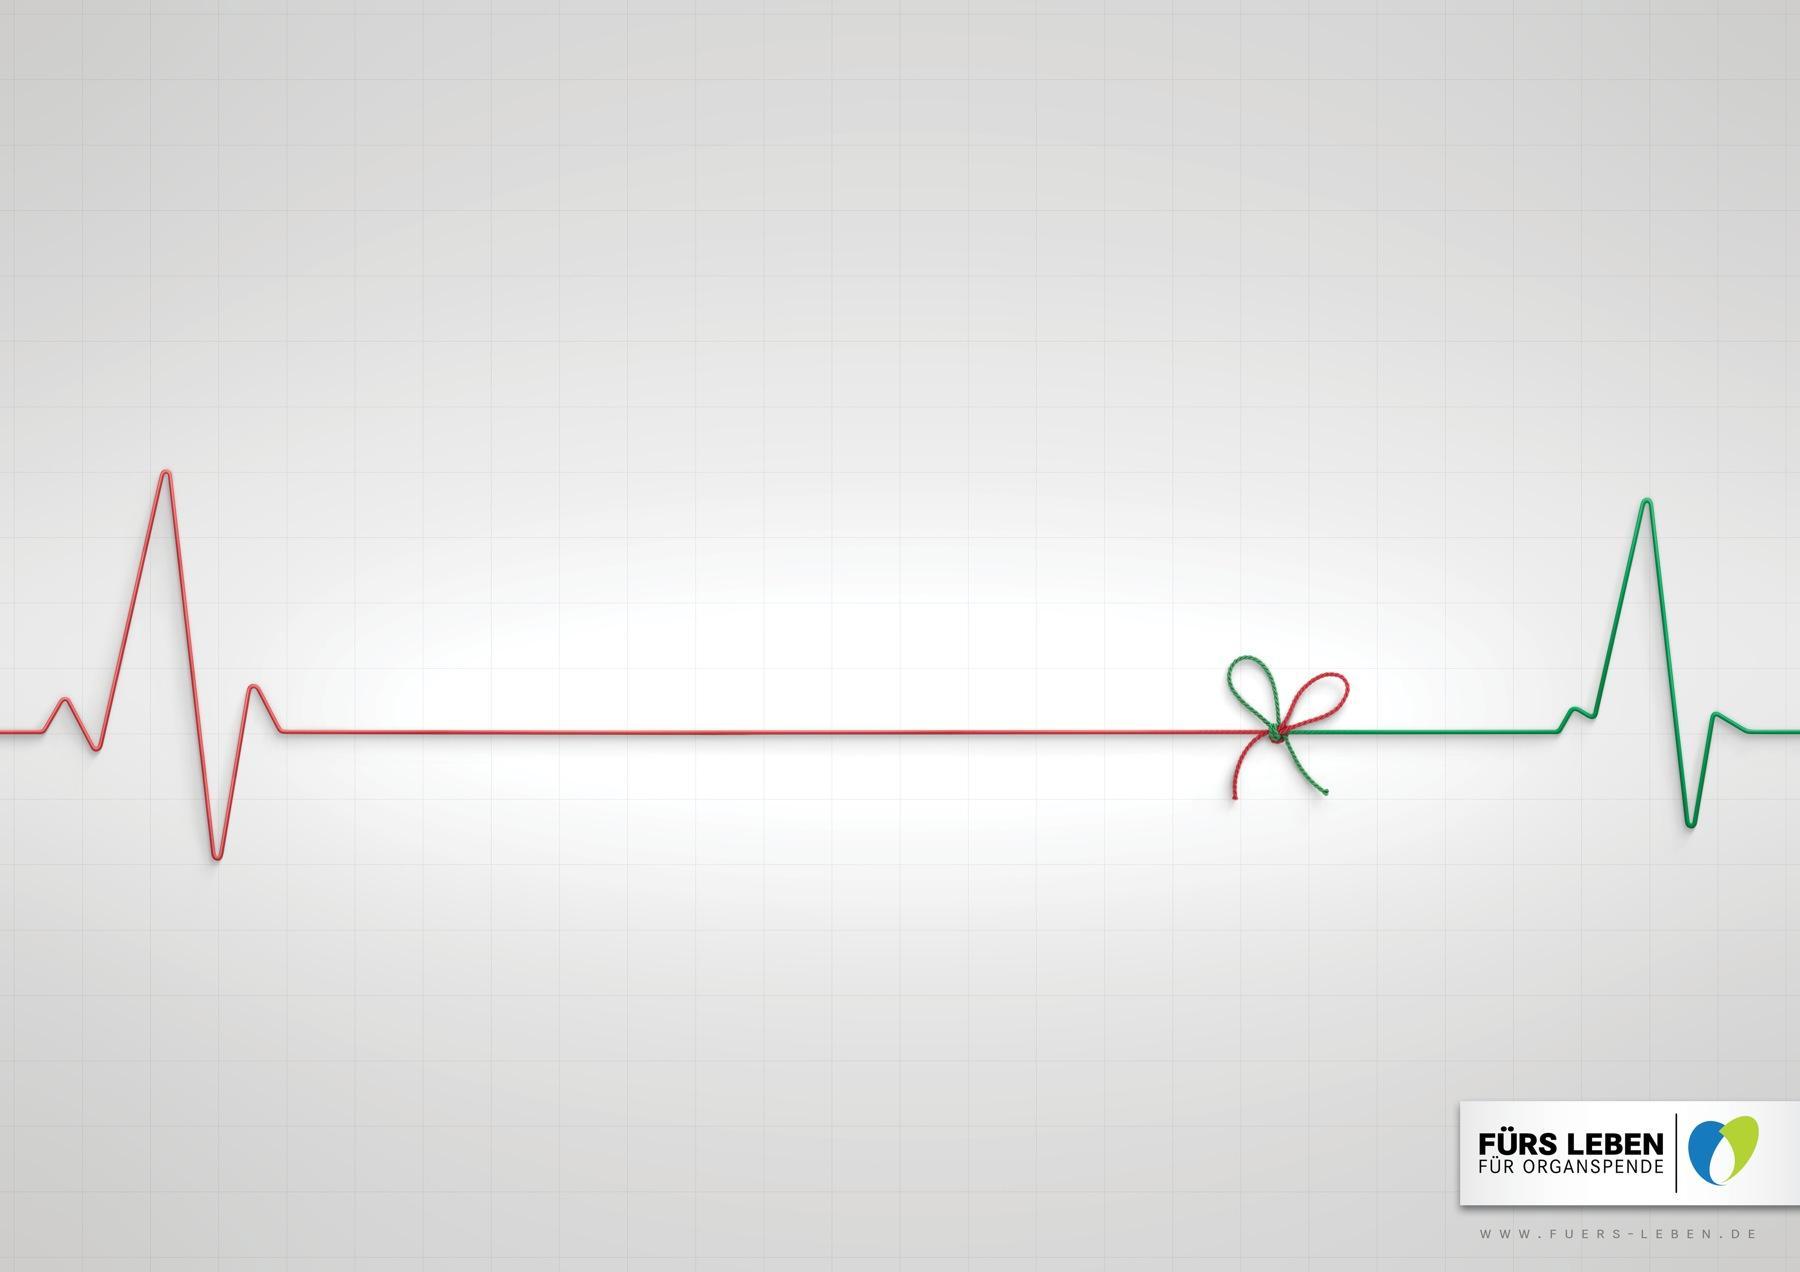 Foundation for Life Print Ad -  Flatline ribbon